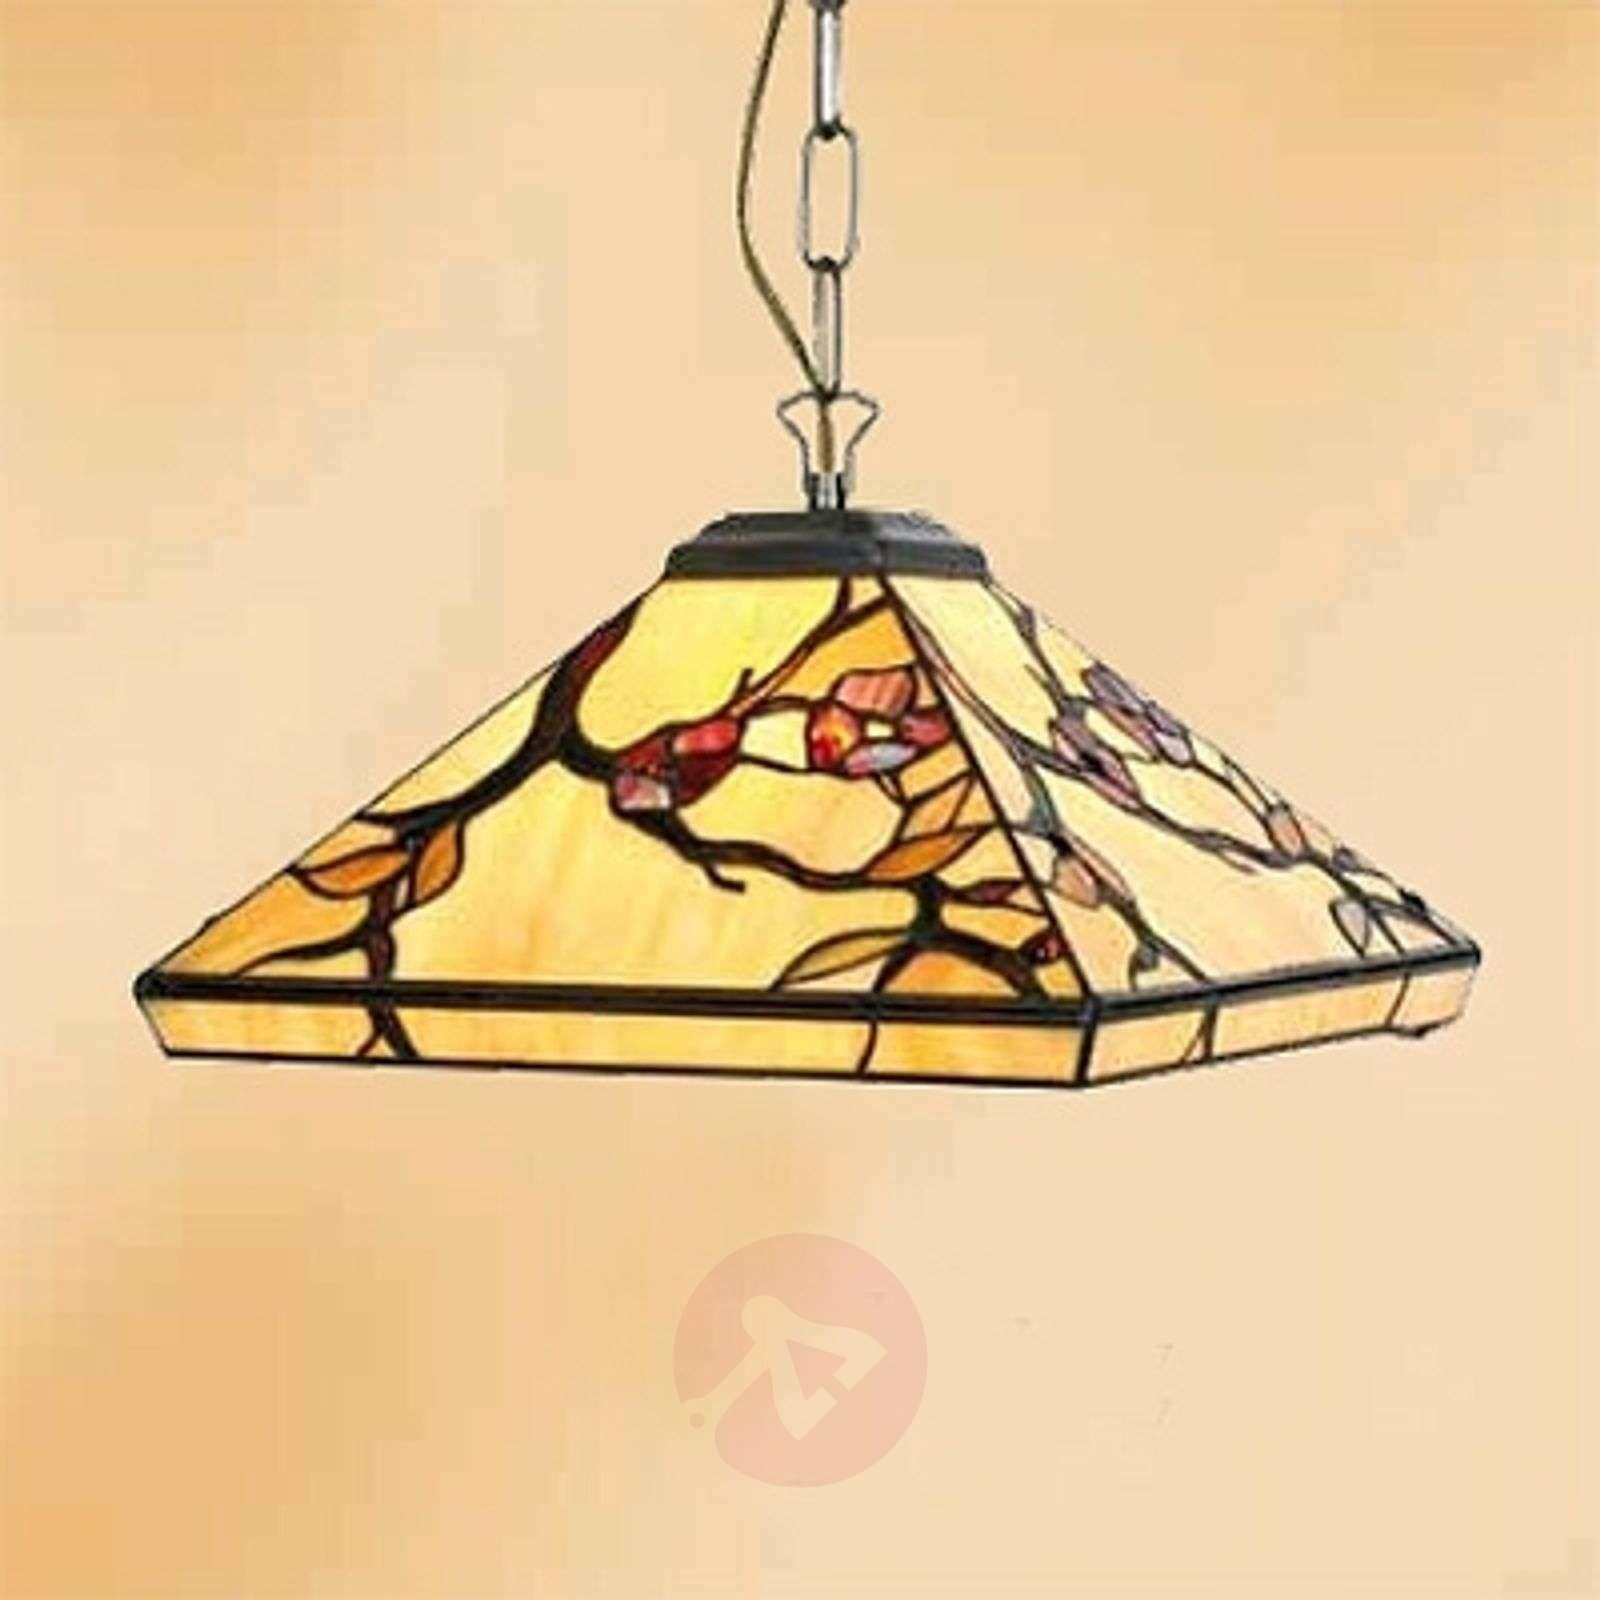 1-bulb ornate hanging light Juliett, Tiffany style-1032285-01